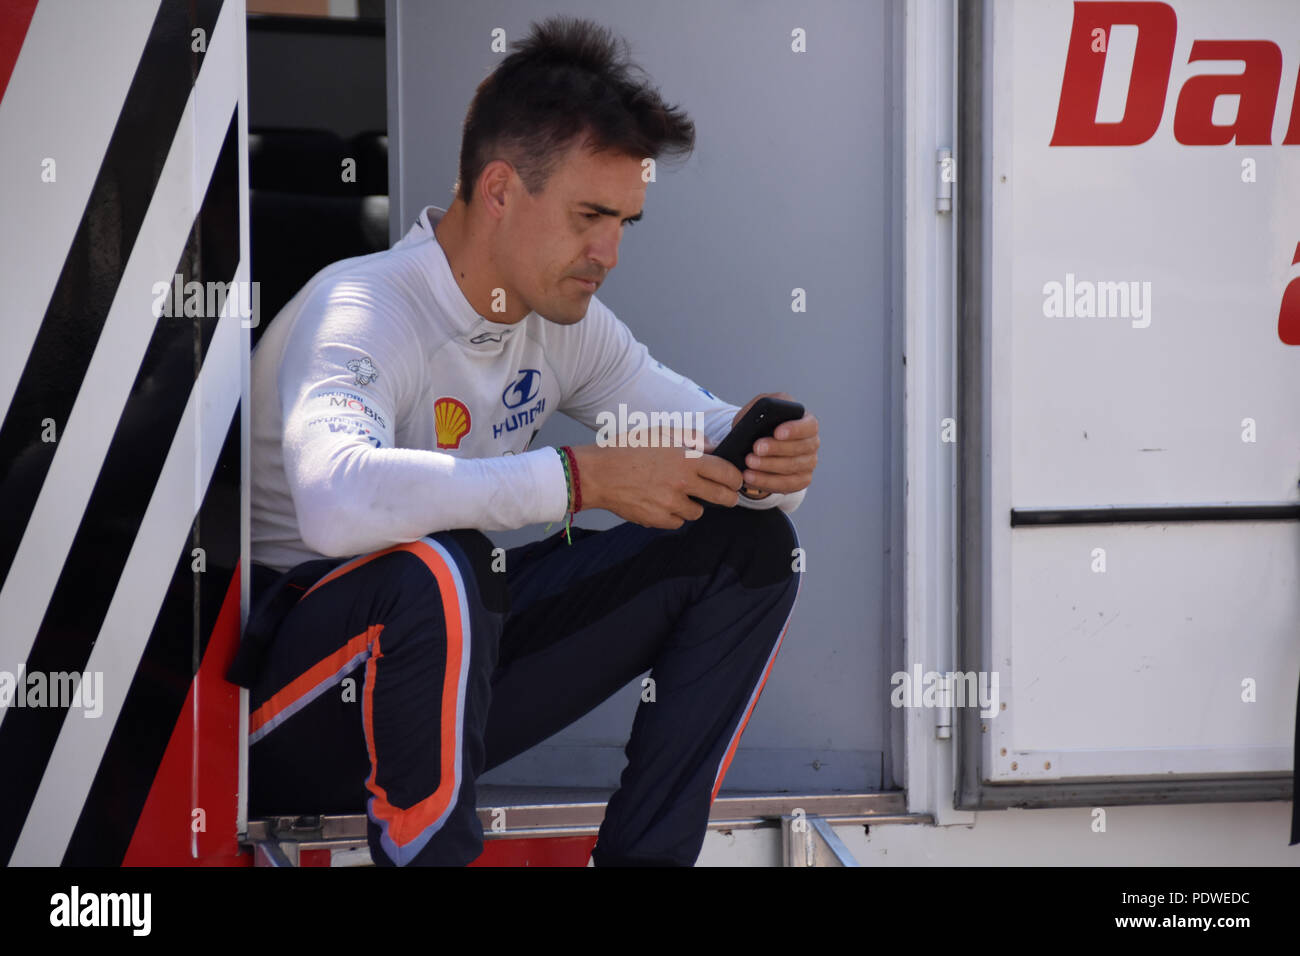 Spanish rally driver Dani Sordo is seen during tests of his Hyundai R5 race car prior to the upcoming Barum rally Zlin, Sobenov, Cesky Krumlov distric - Stock Image